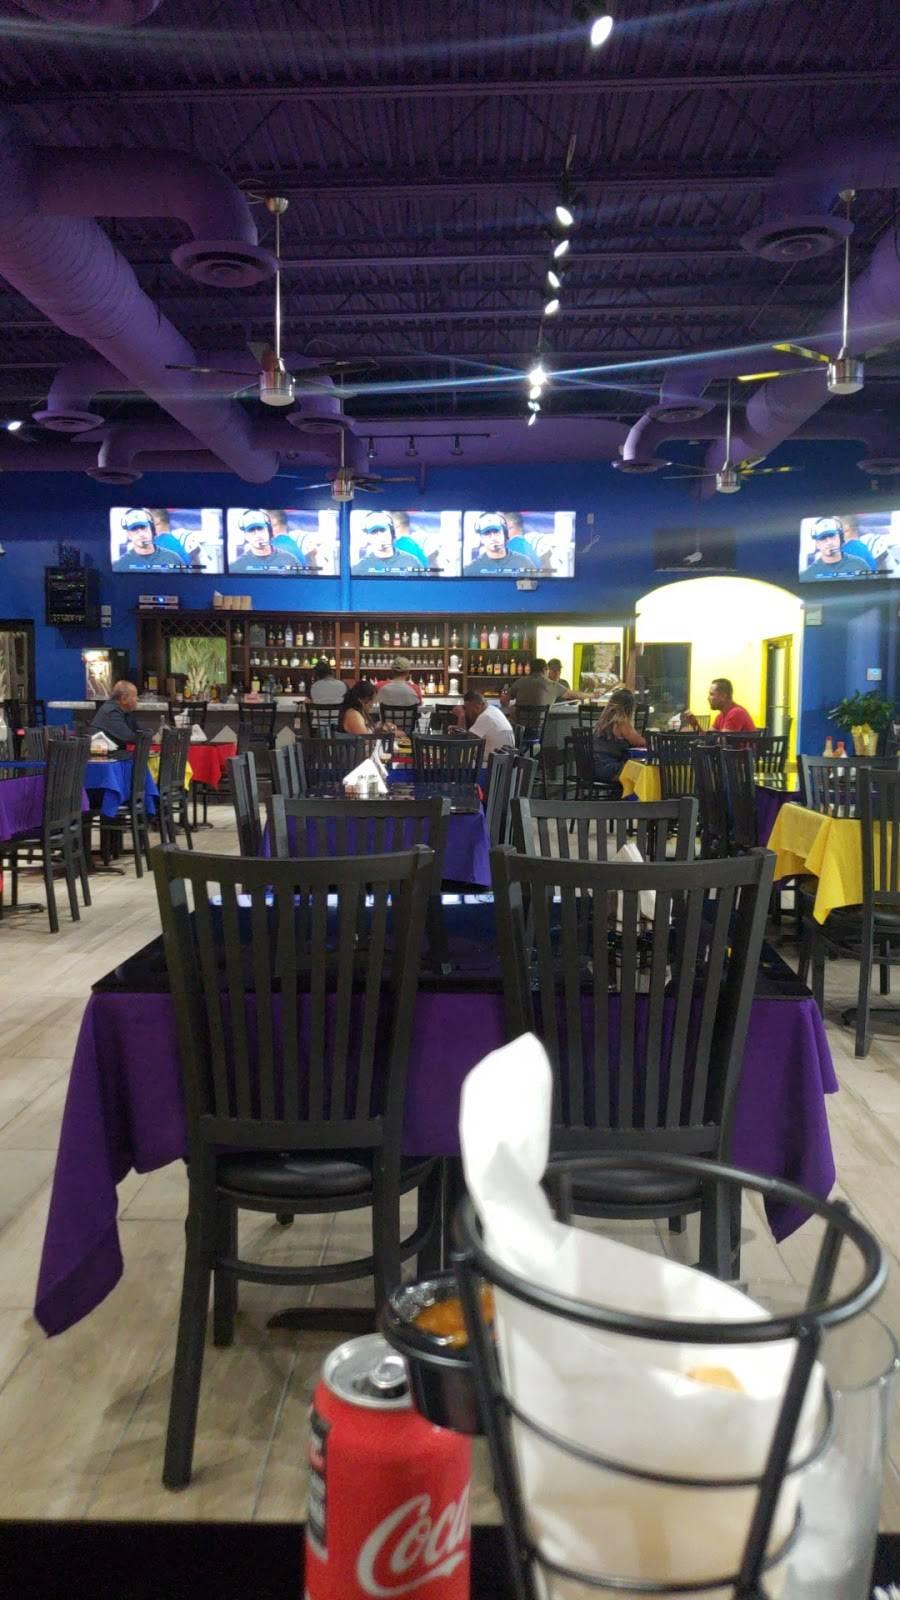 Morelias Mexican Restaurant & Seafood | restaurant | 1034 S Buckner Blvd, Dallas, TX 75217, USA | 2145799557 OR +1 214-579-9557